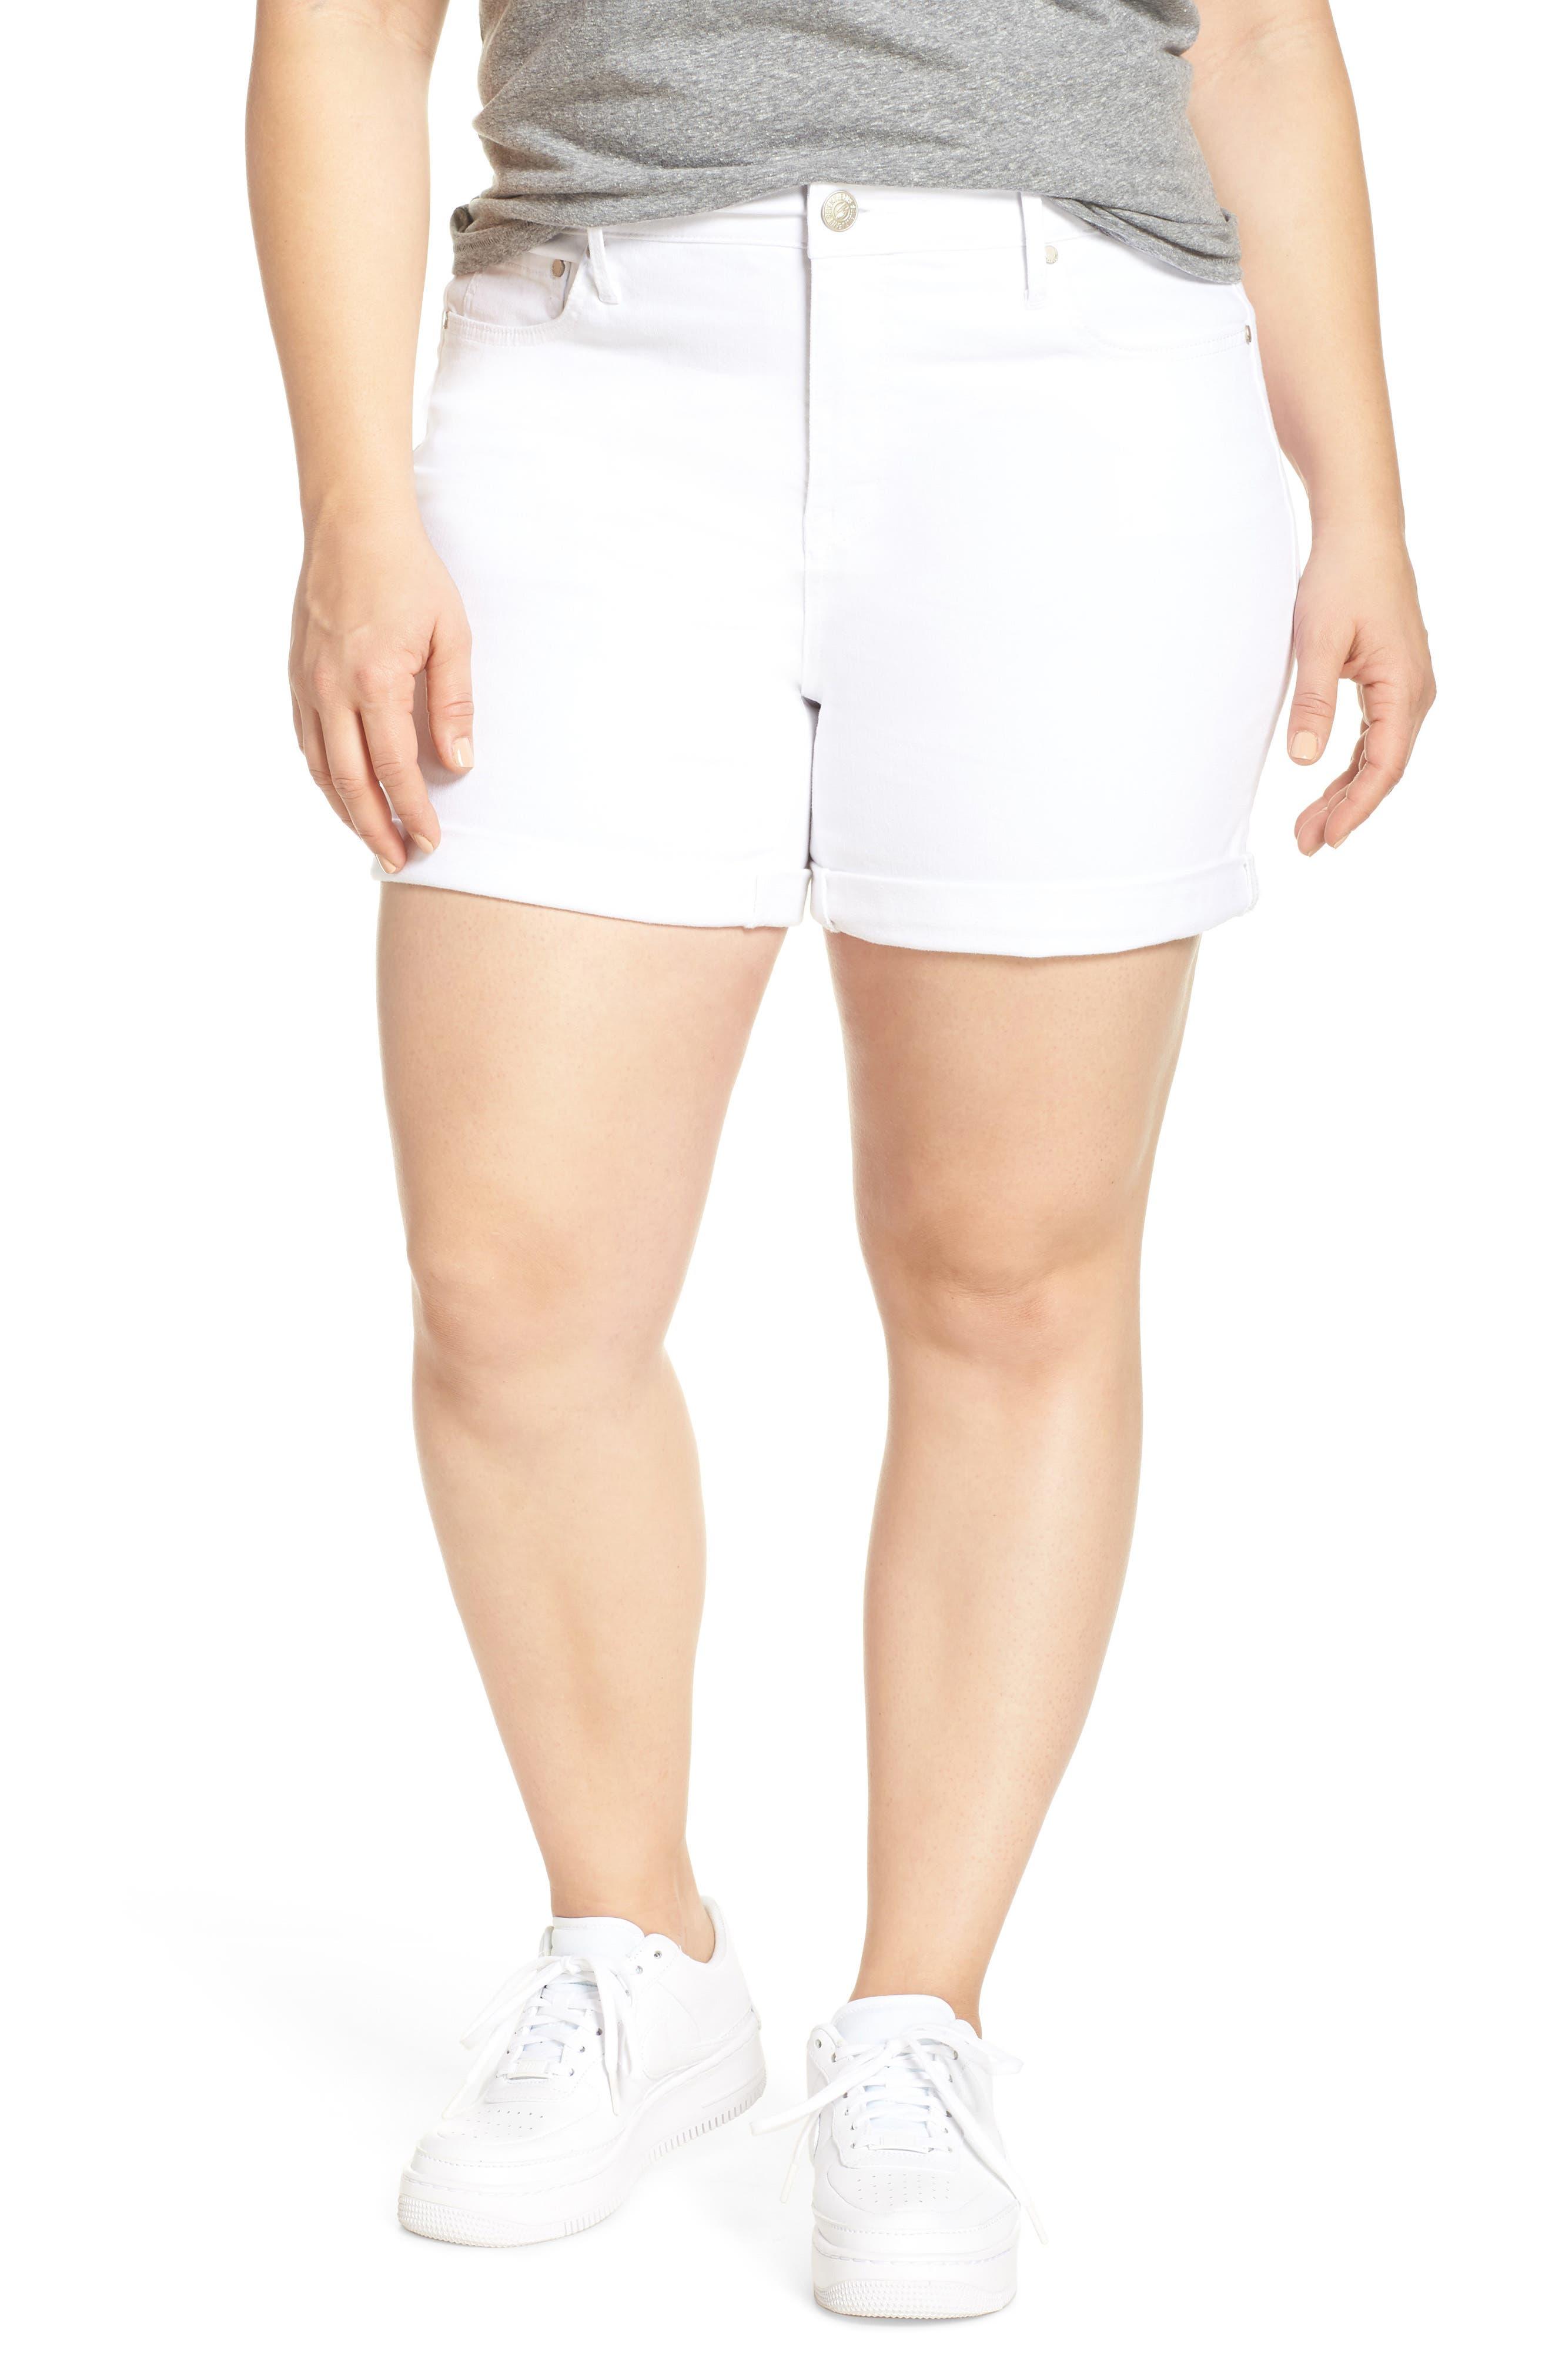 SEVEN7, High Waist Stretch Denim Shorts, Main thumbnail 1, color, BLANC DE BLANC